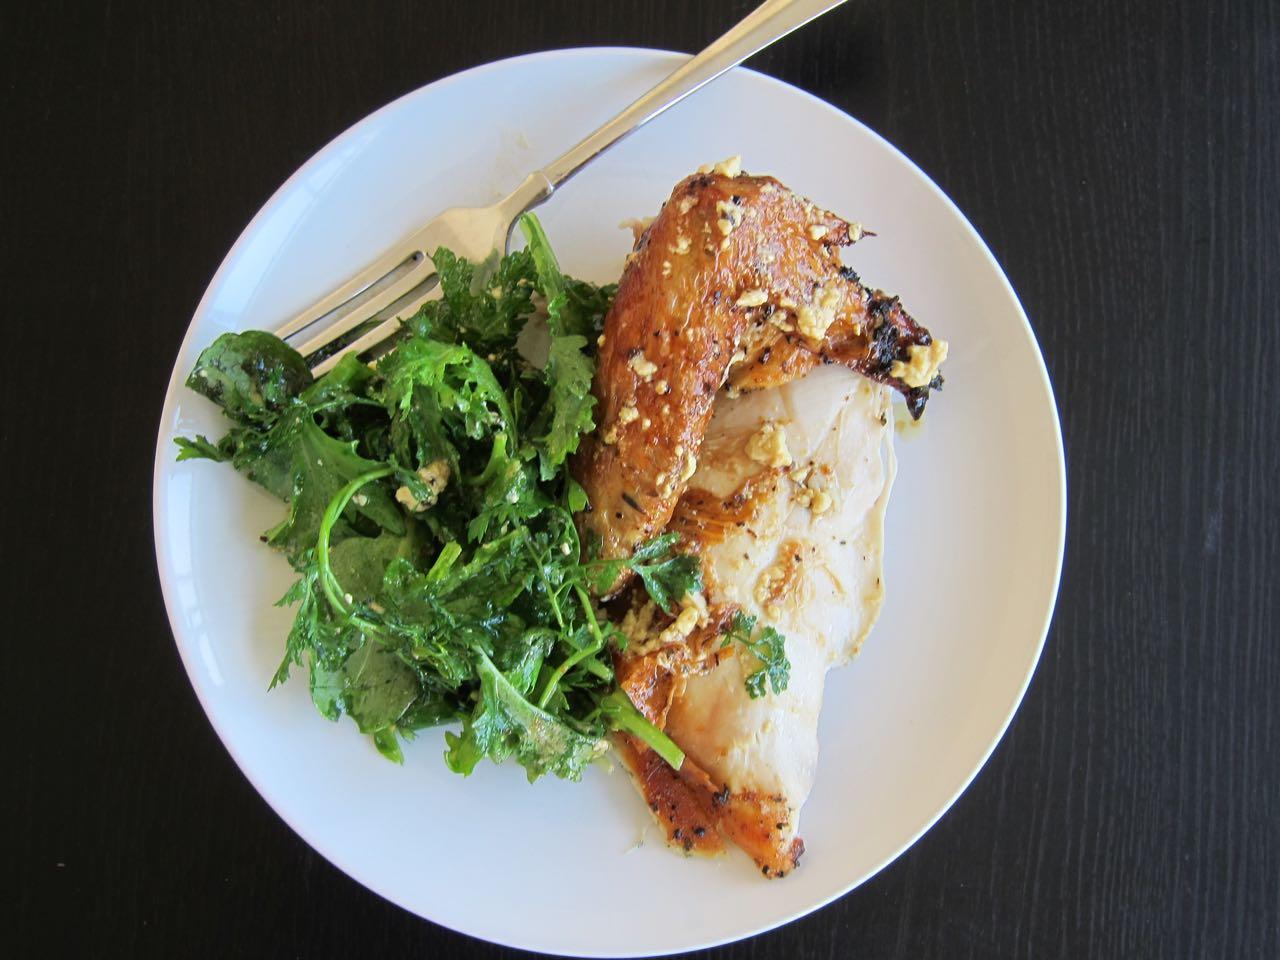 Feta Brined Roast Chicken and Greens